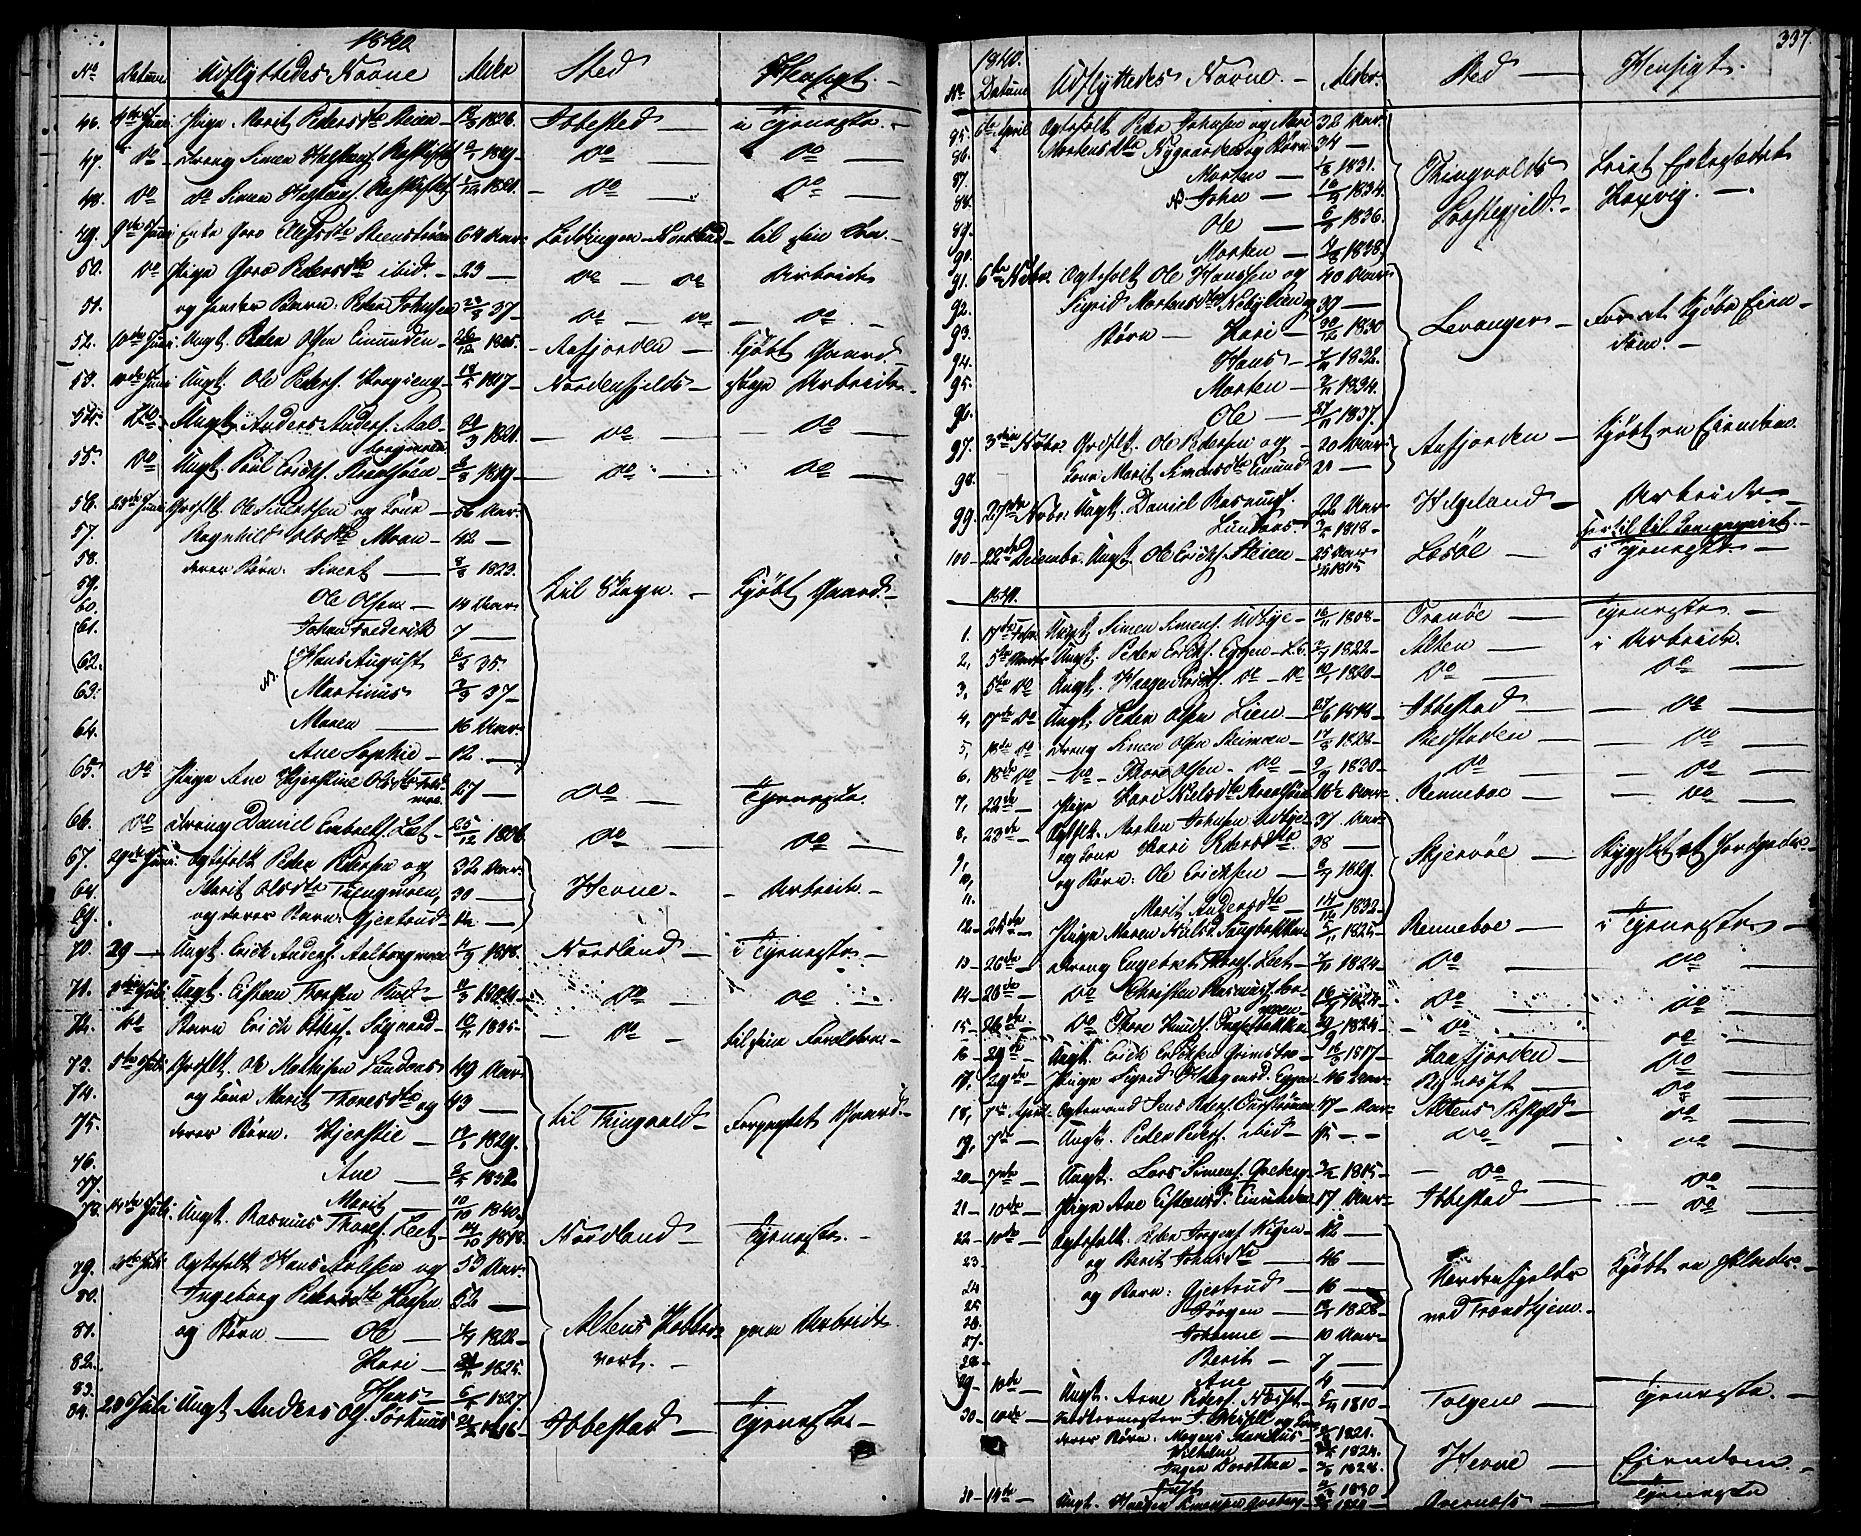 SAH, Tynset prestekontor, Ministerialbok nr. 19, 1829-1847, s. 337